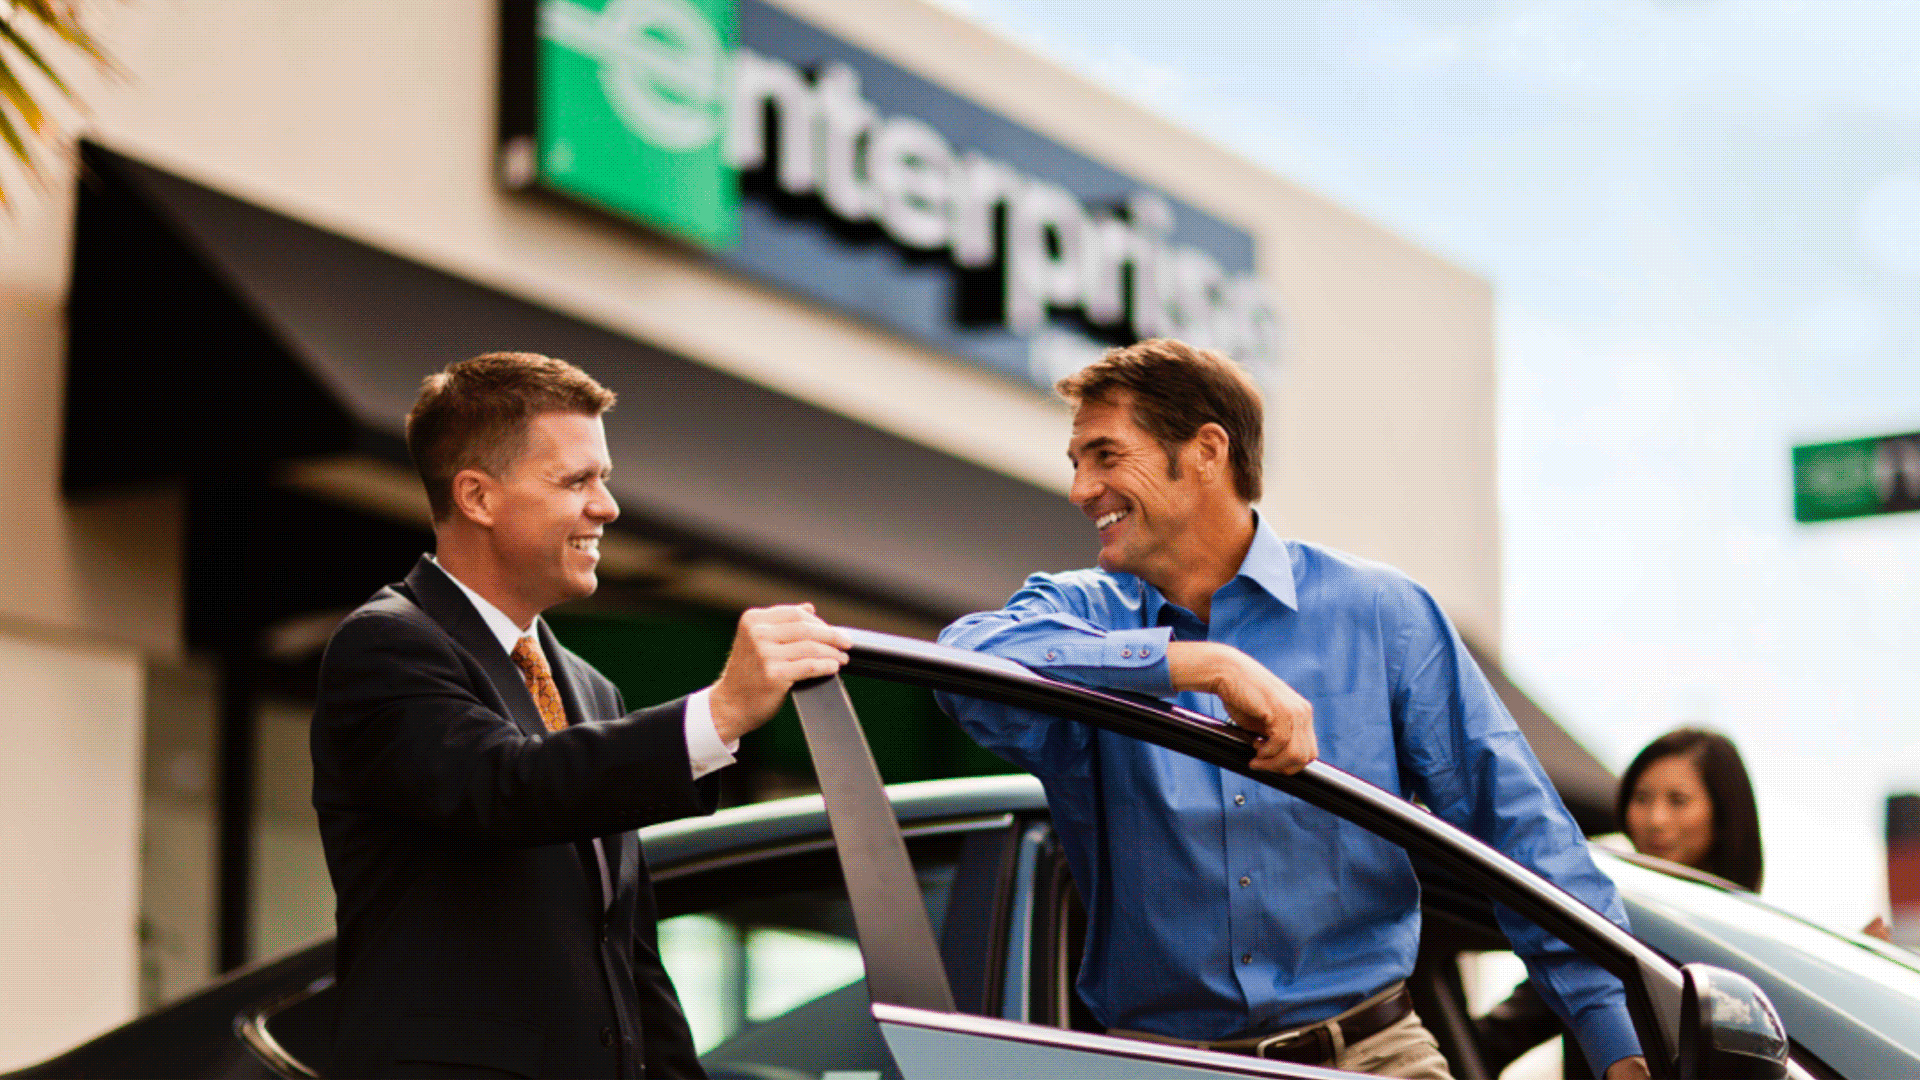 Enterprise Car Rental Coupon code